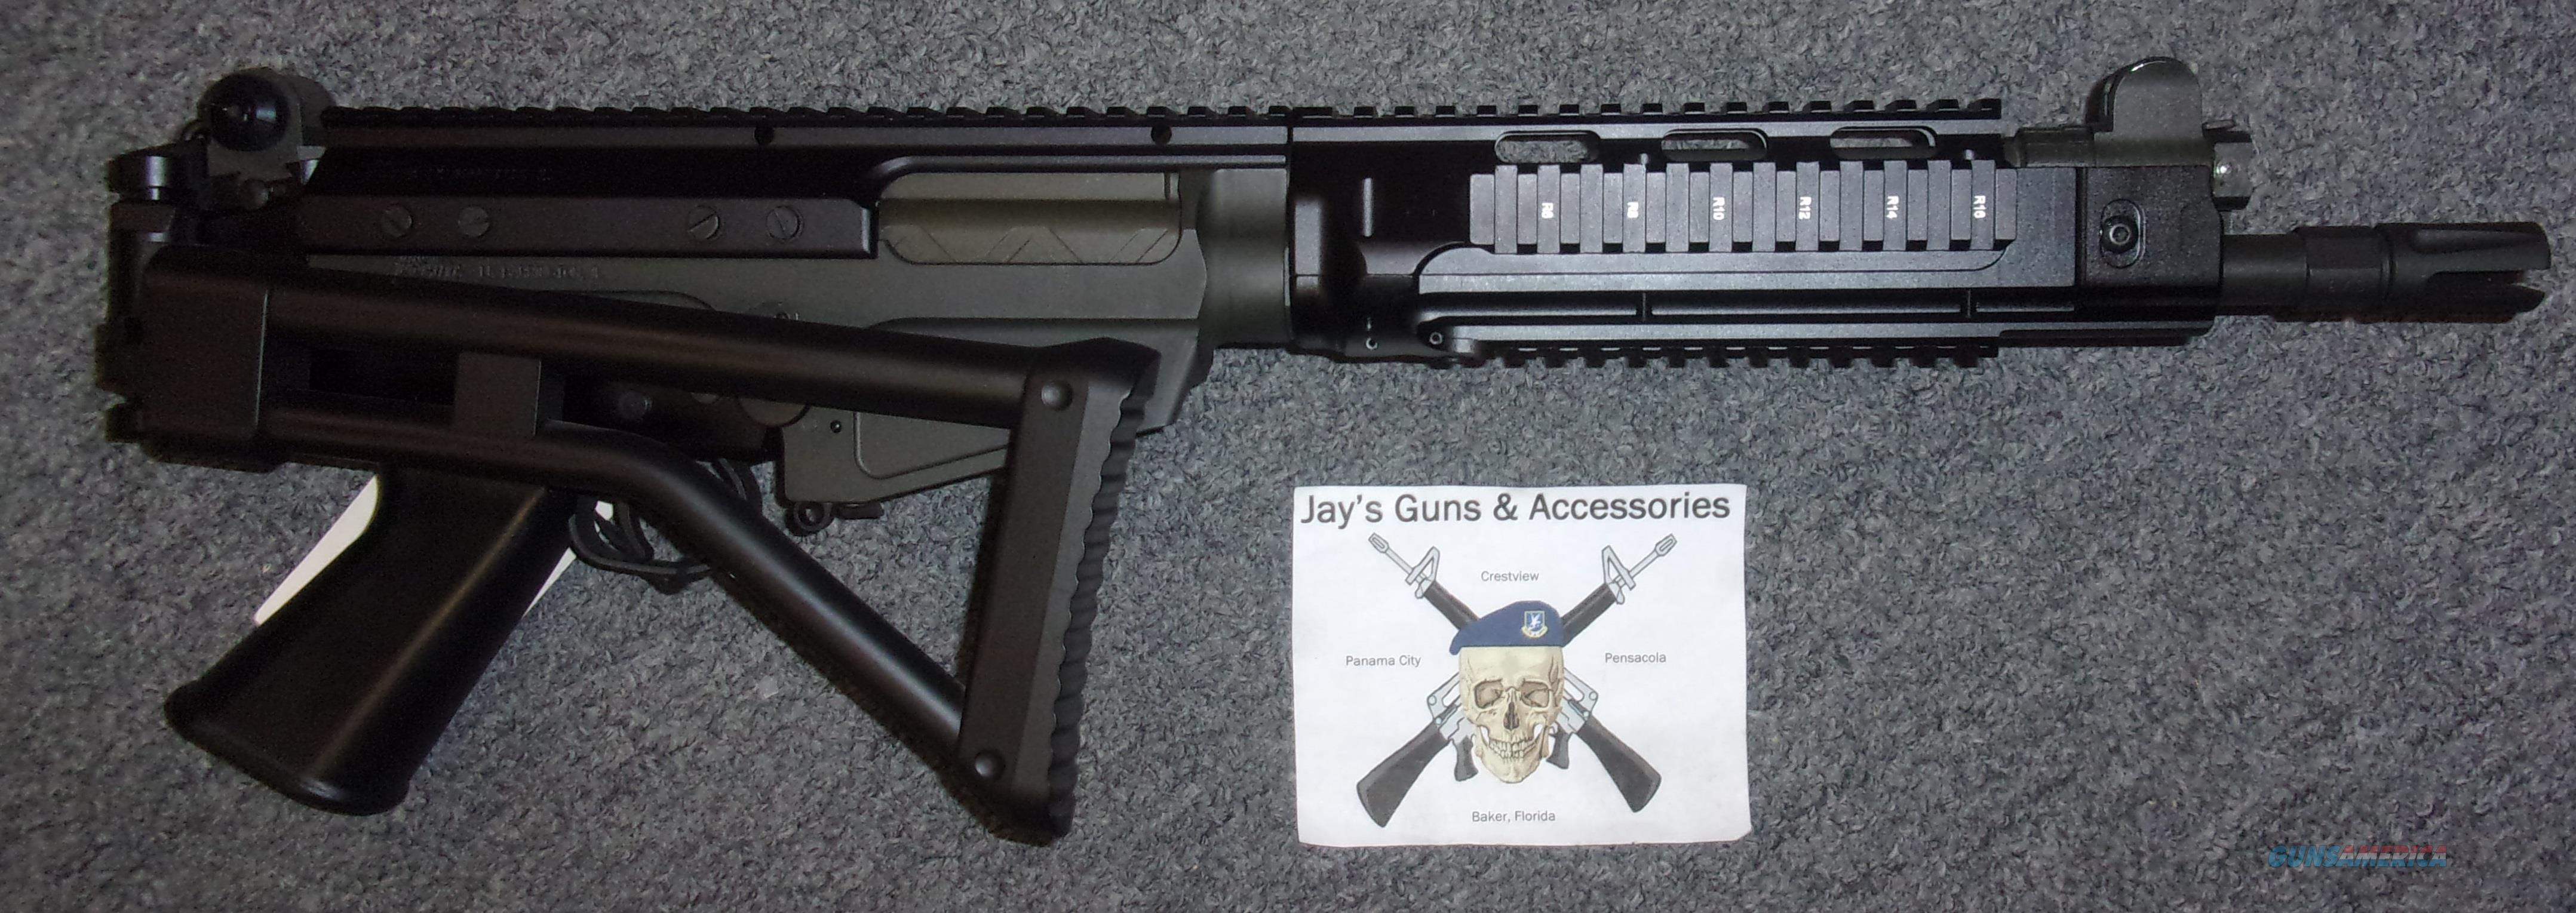 DSA SA58OSW Short Barreled Rifle  Guns > Rifles > Class 3 Rifles > Class 3 Any Other Weapon